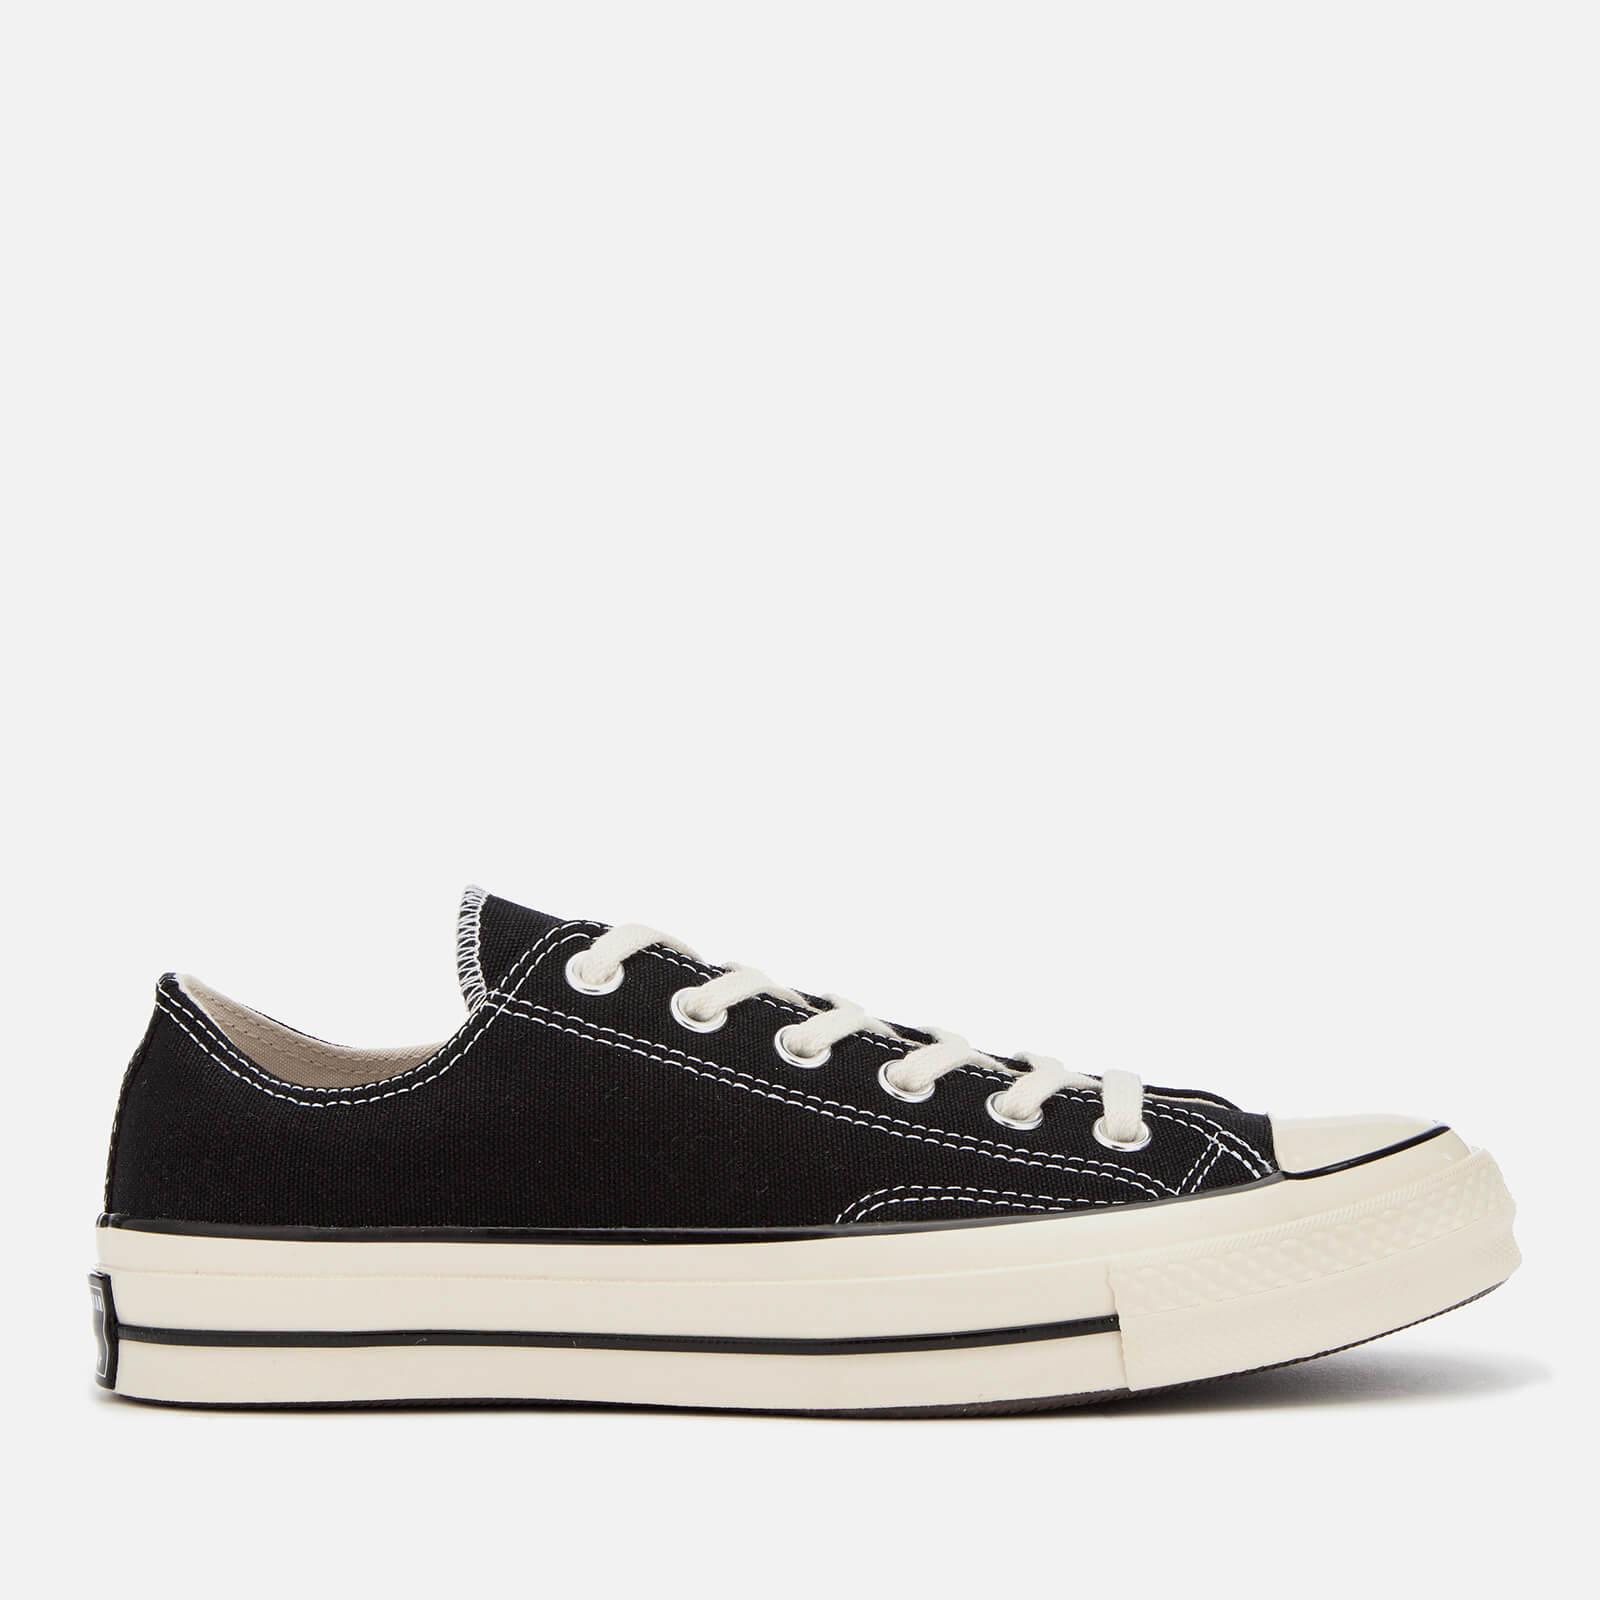 Converse Chuck 70 Ox Trainers - Black/Black/Egret - UK 3 - Black